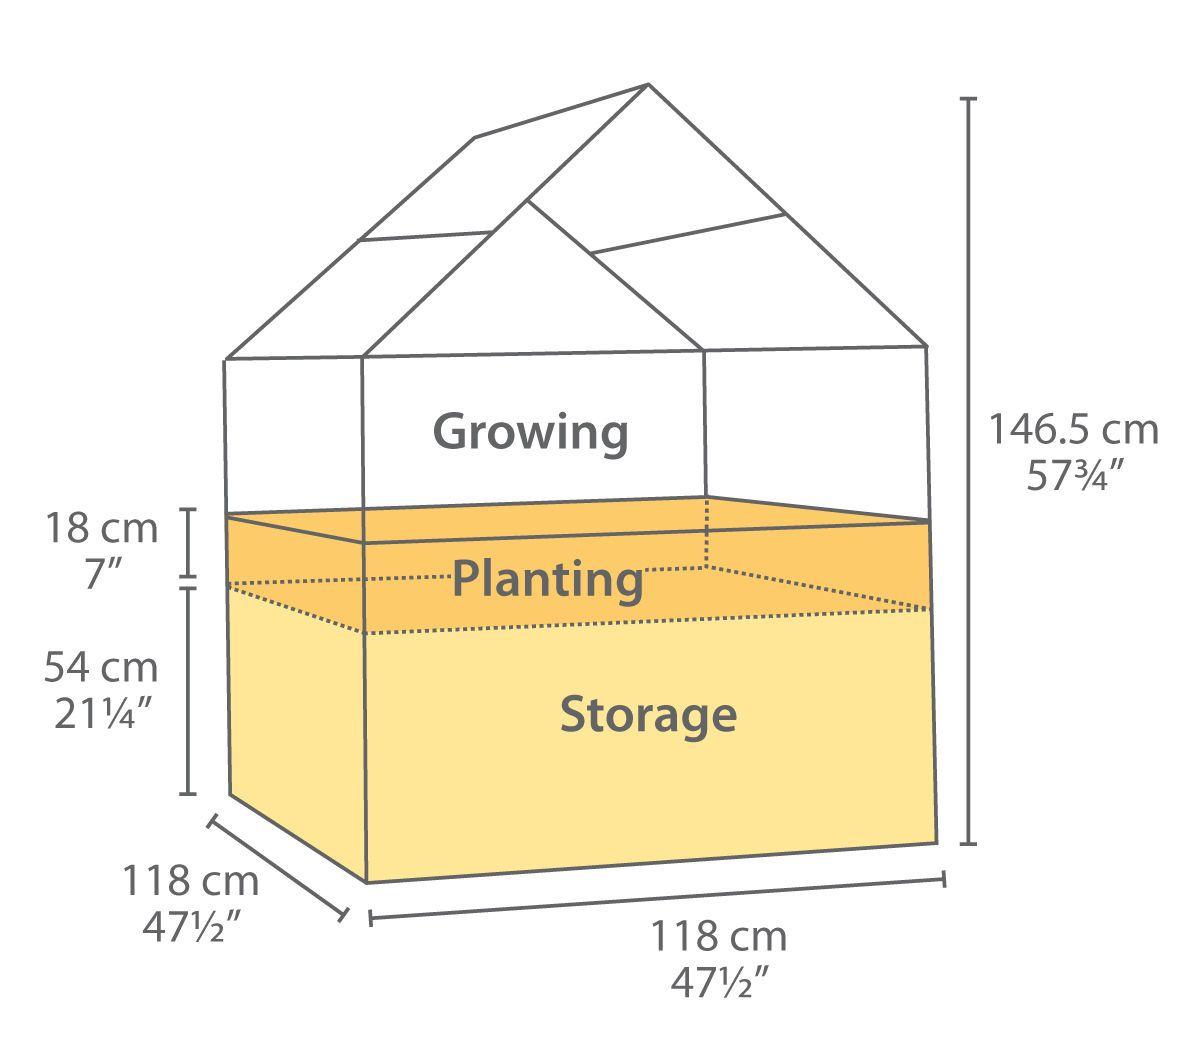 palram aluminium hochbeet anzuchtbeet gewächshaus plantino plant-inn